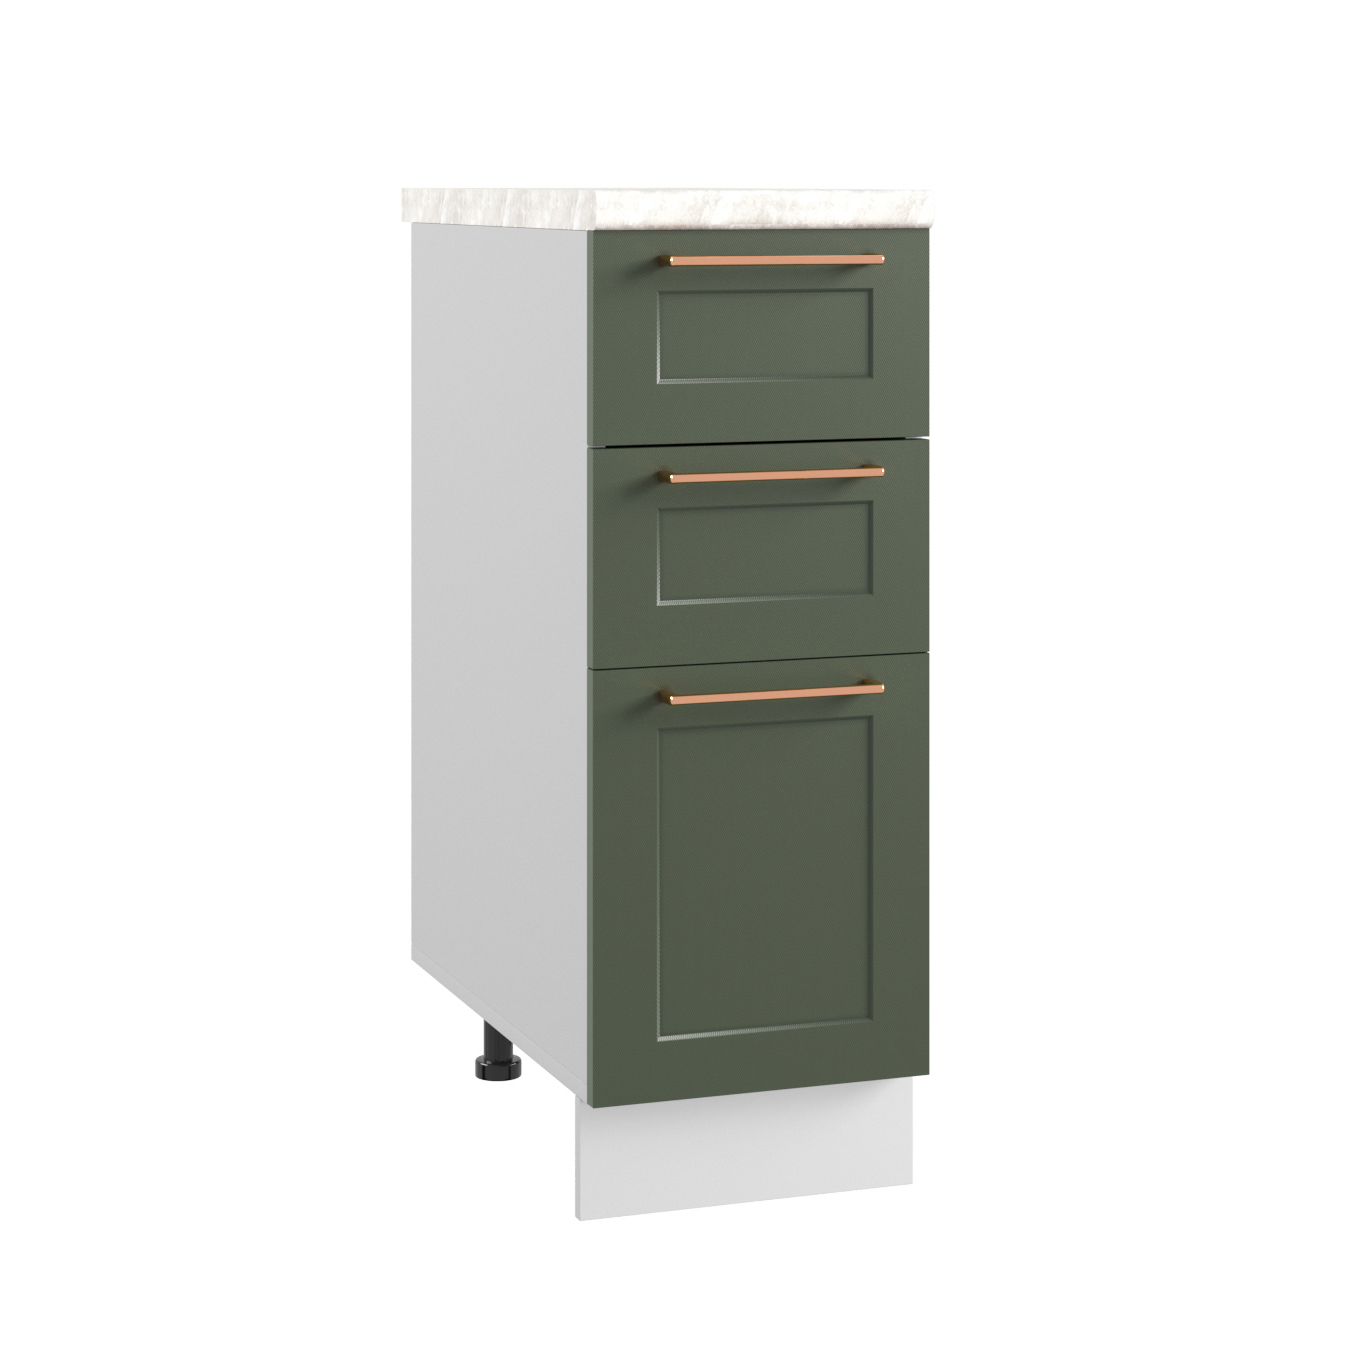 Кухня Квадро СМЯ 300 Шкаф нижний ящики с метабоксами